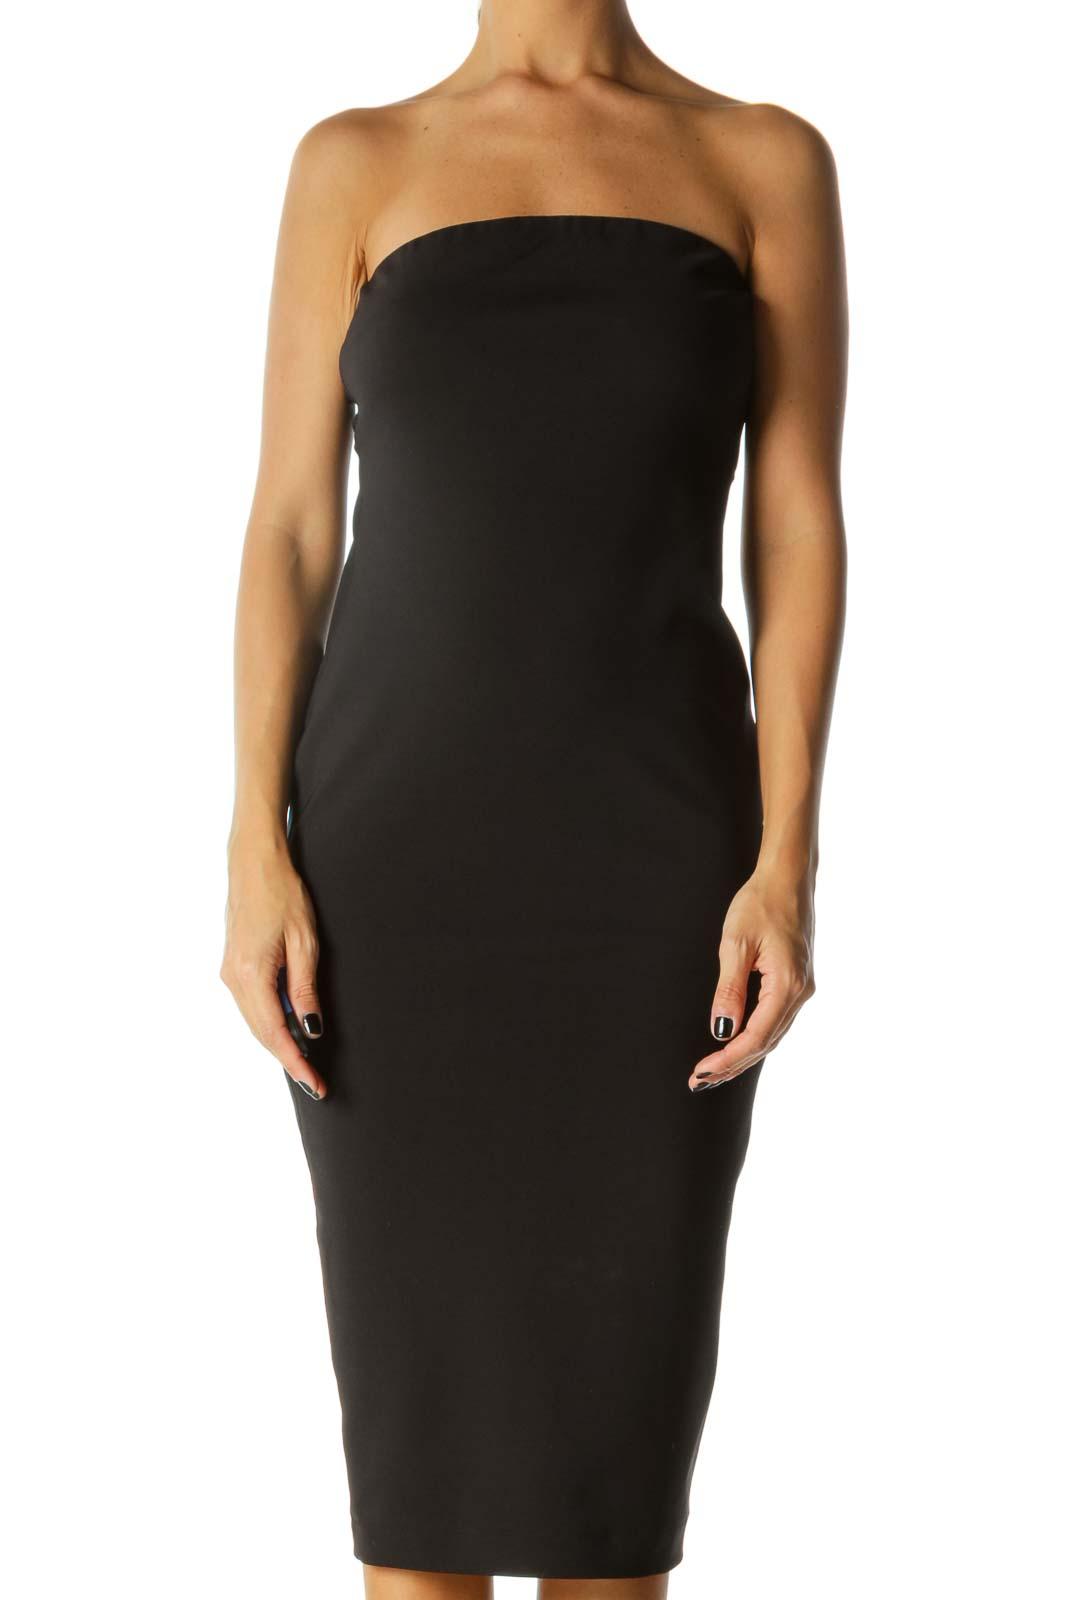 Black Strapless Bodycon Dress